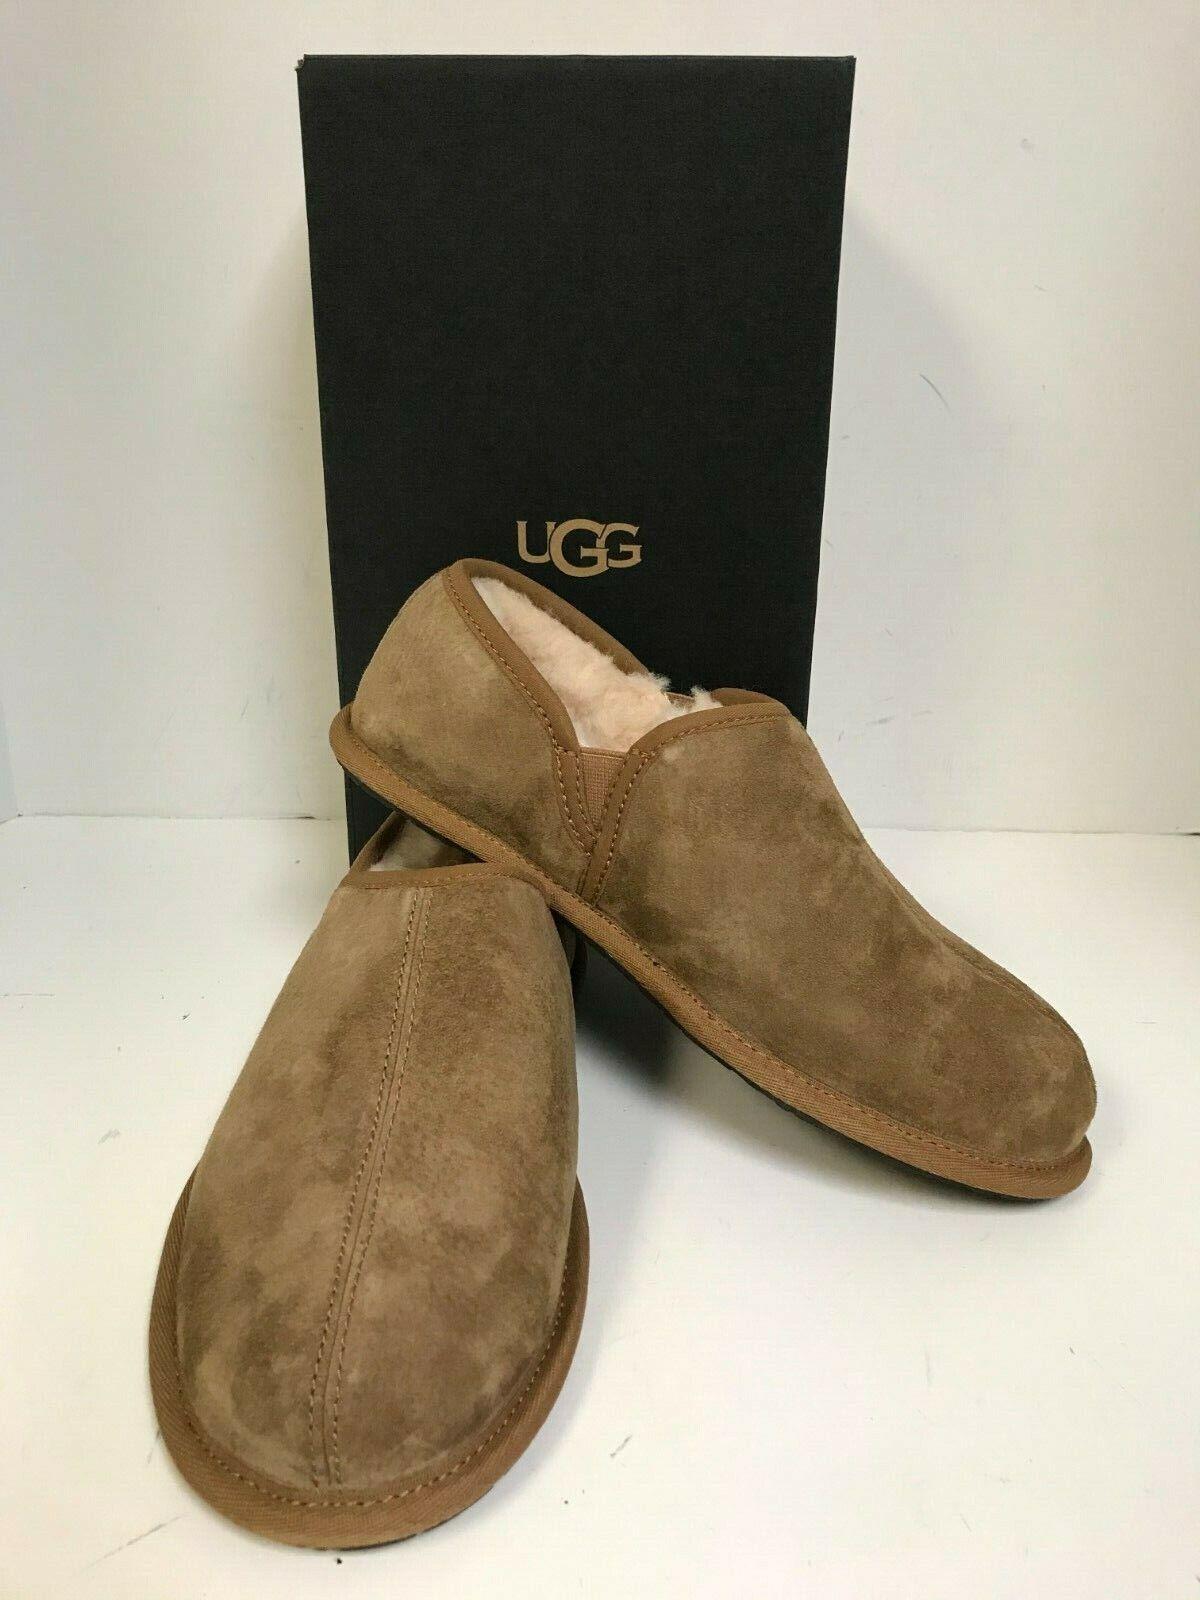 UGG Men's Scuff Romeo II Chestnut Suede Fur Lined Slippers